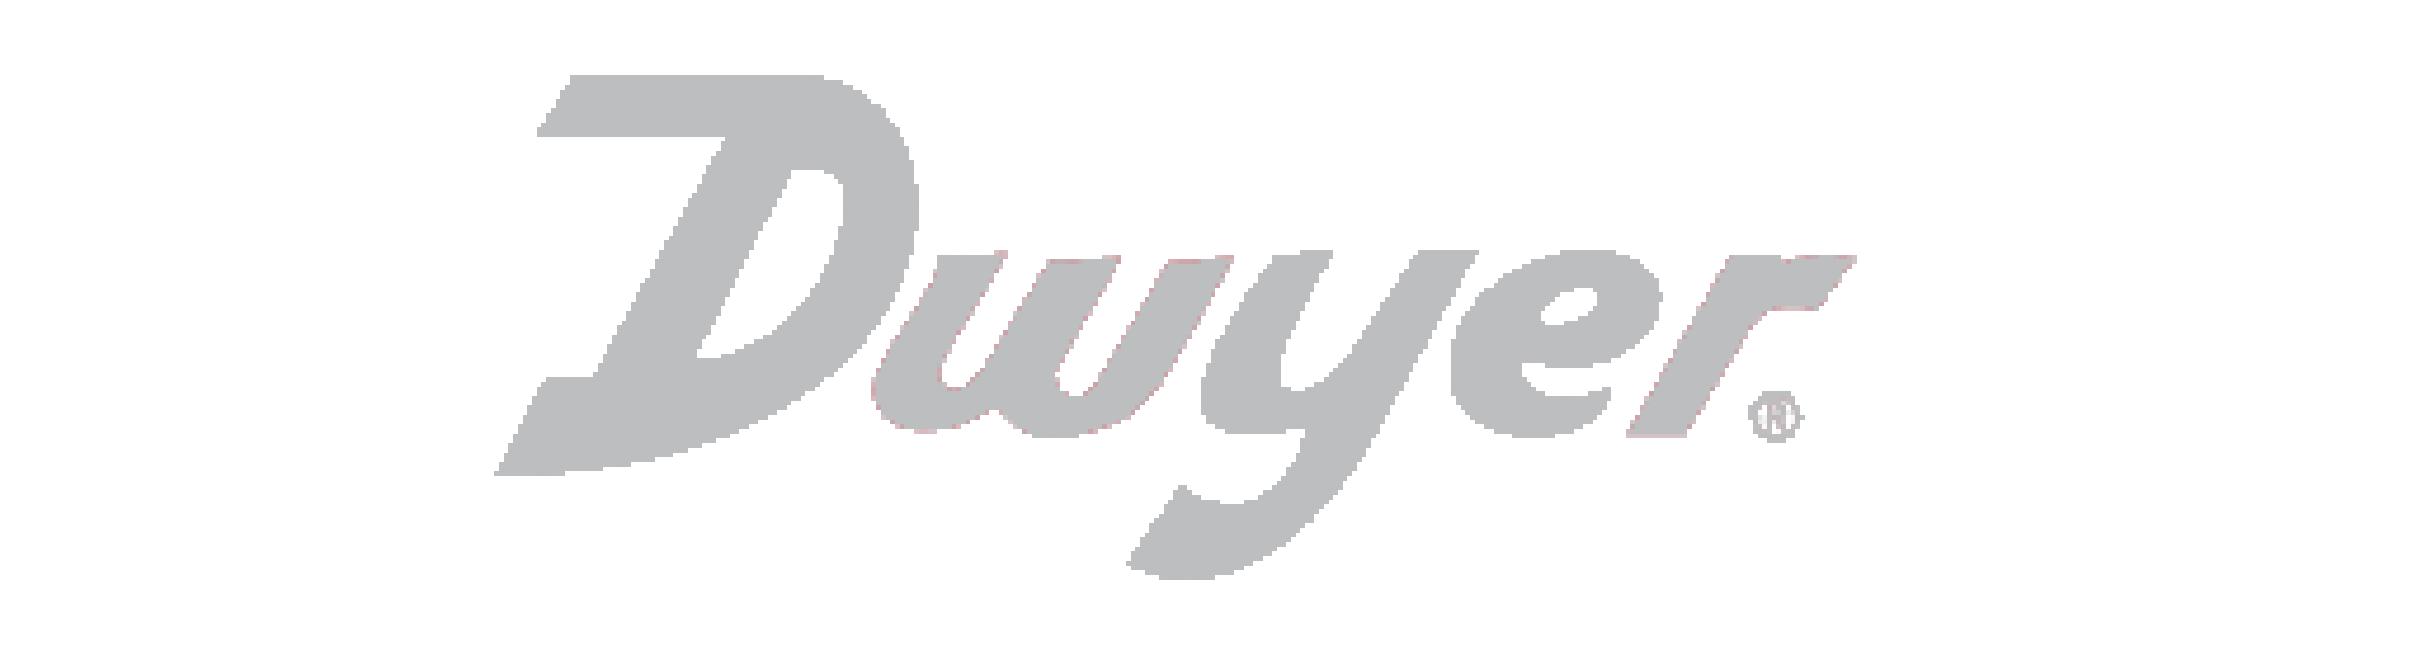 dwyer grey-01.png